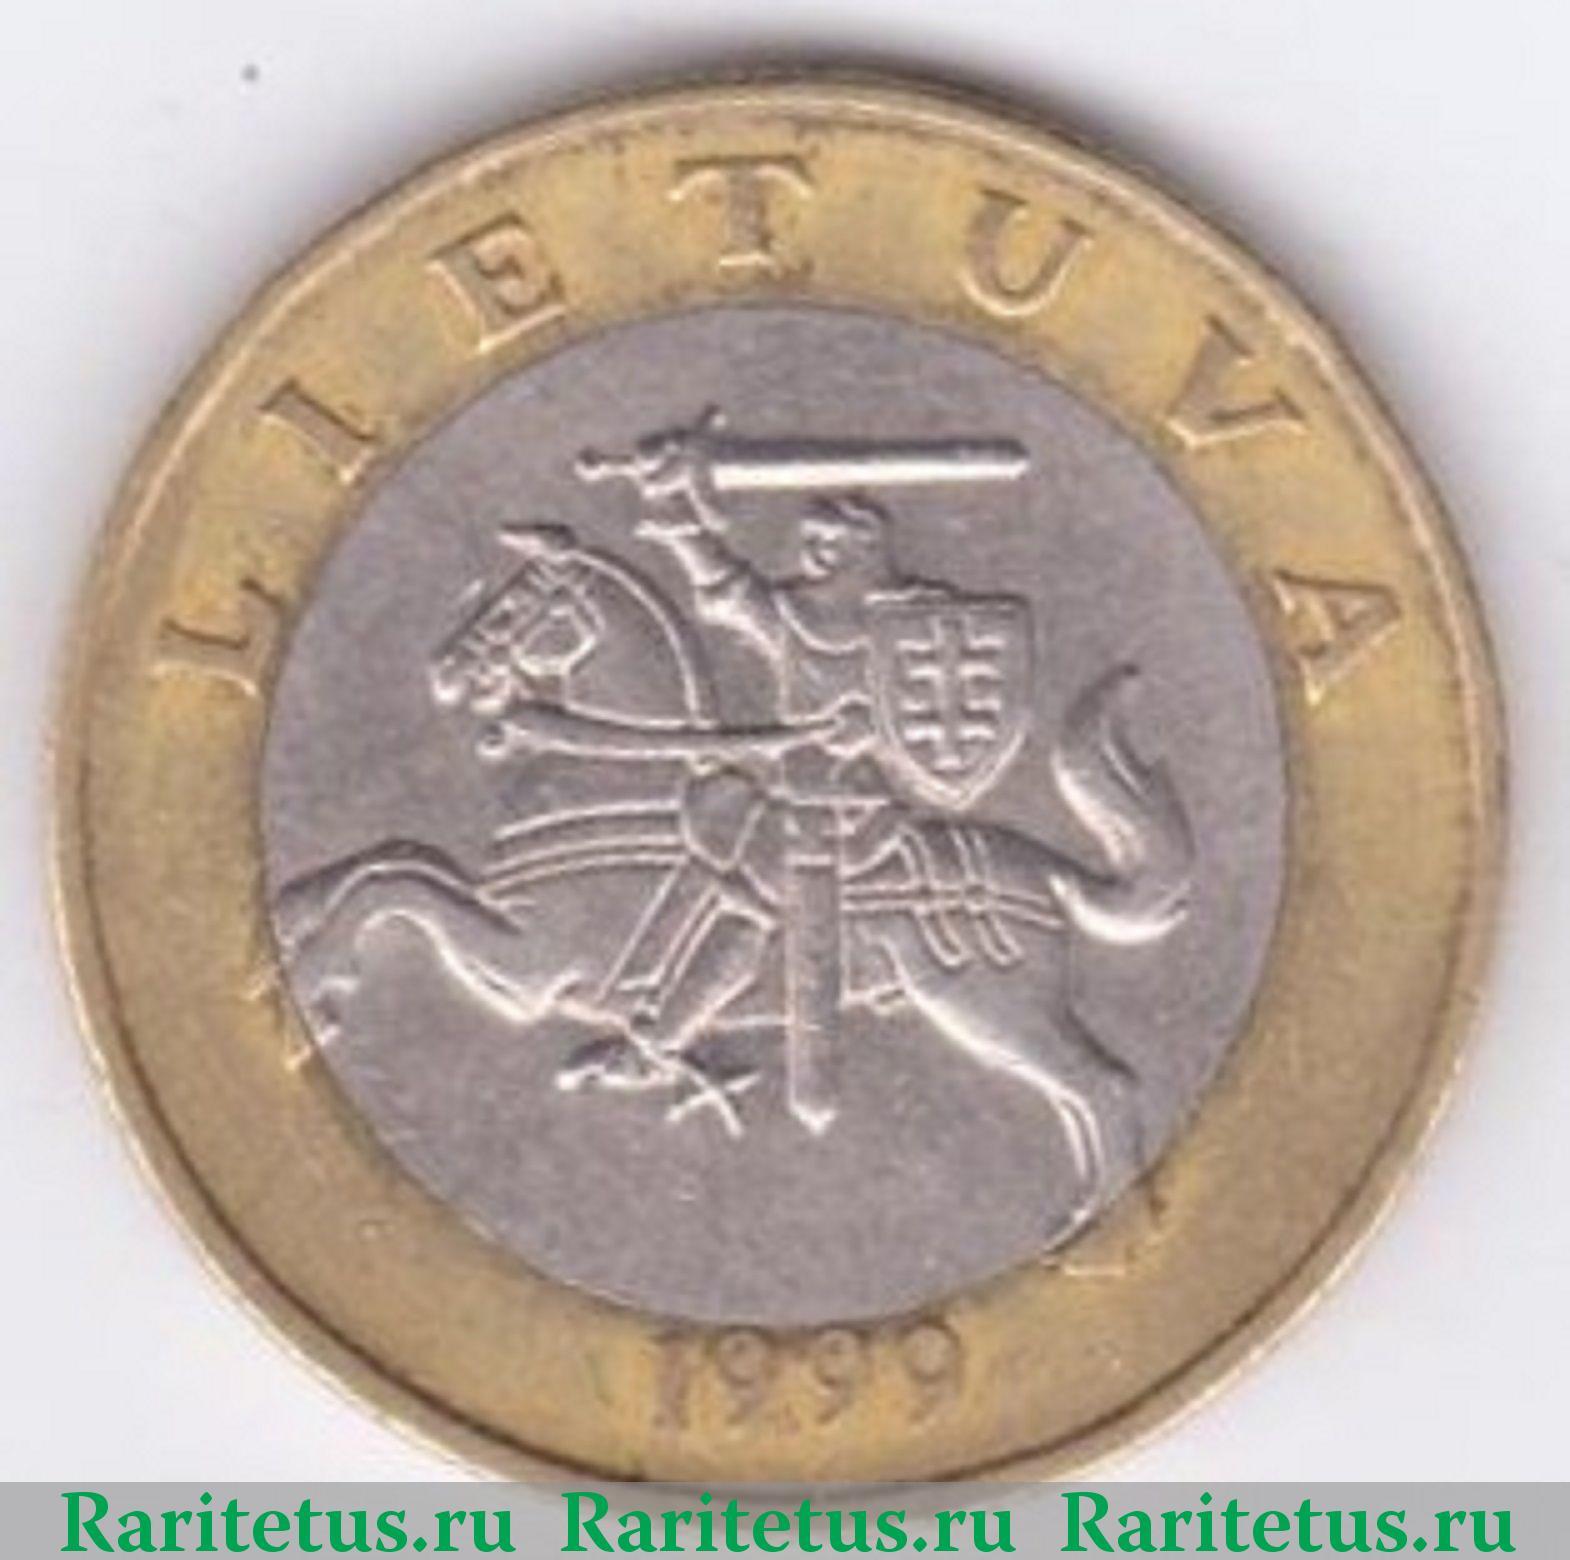 2 litai 1999 г цена купить беркут 5